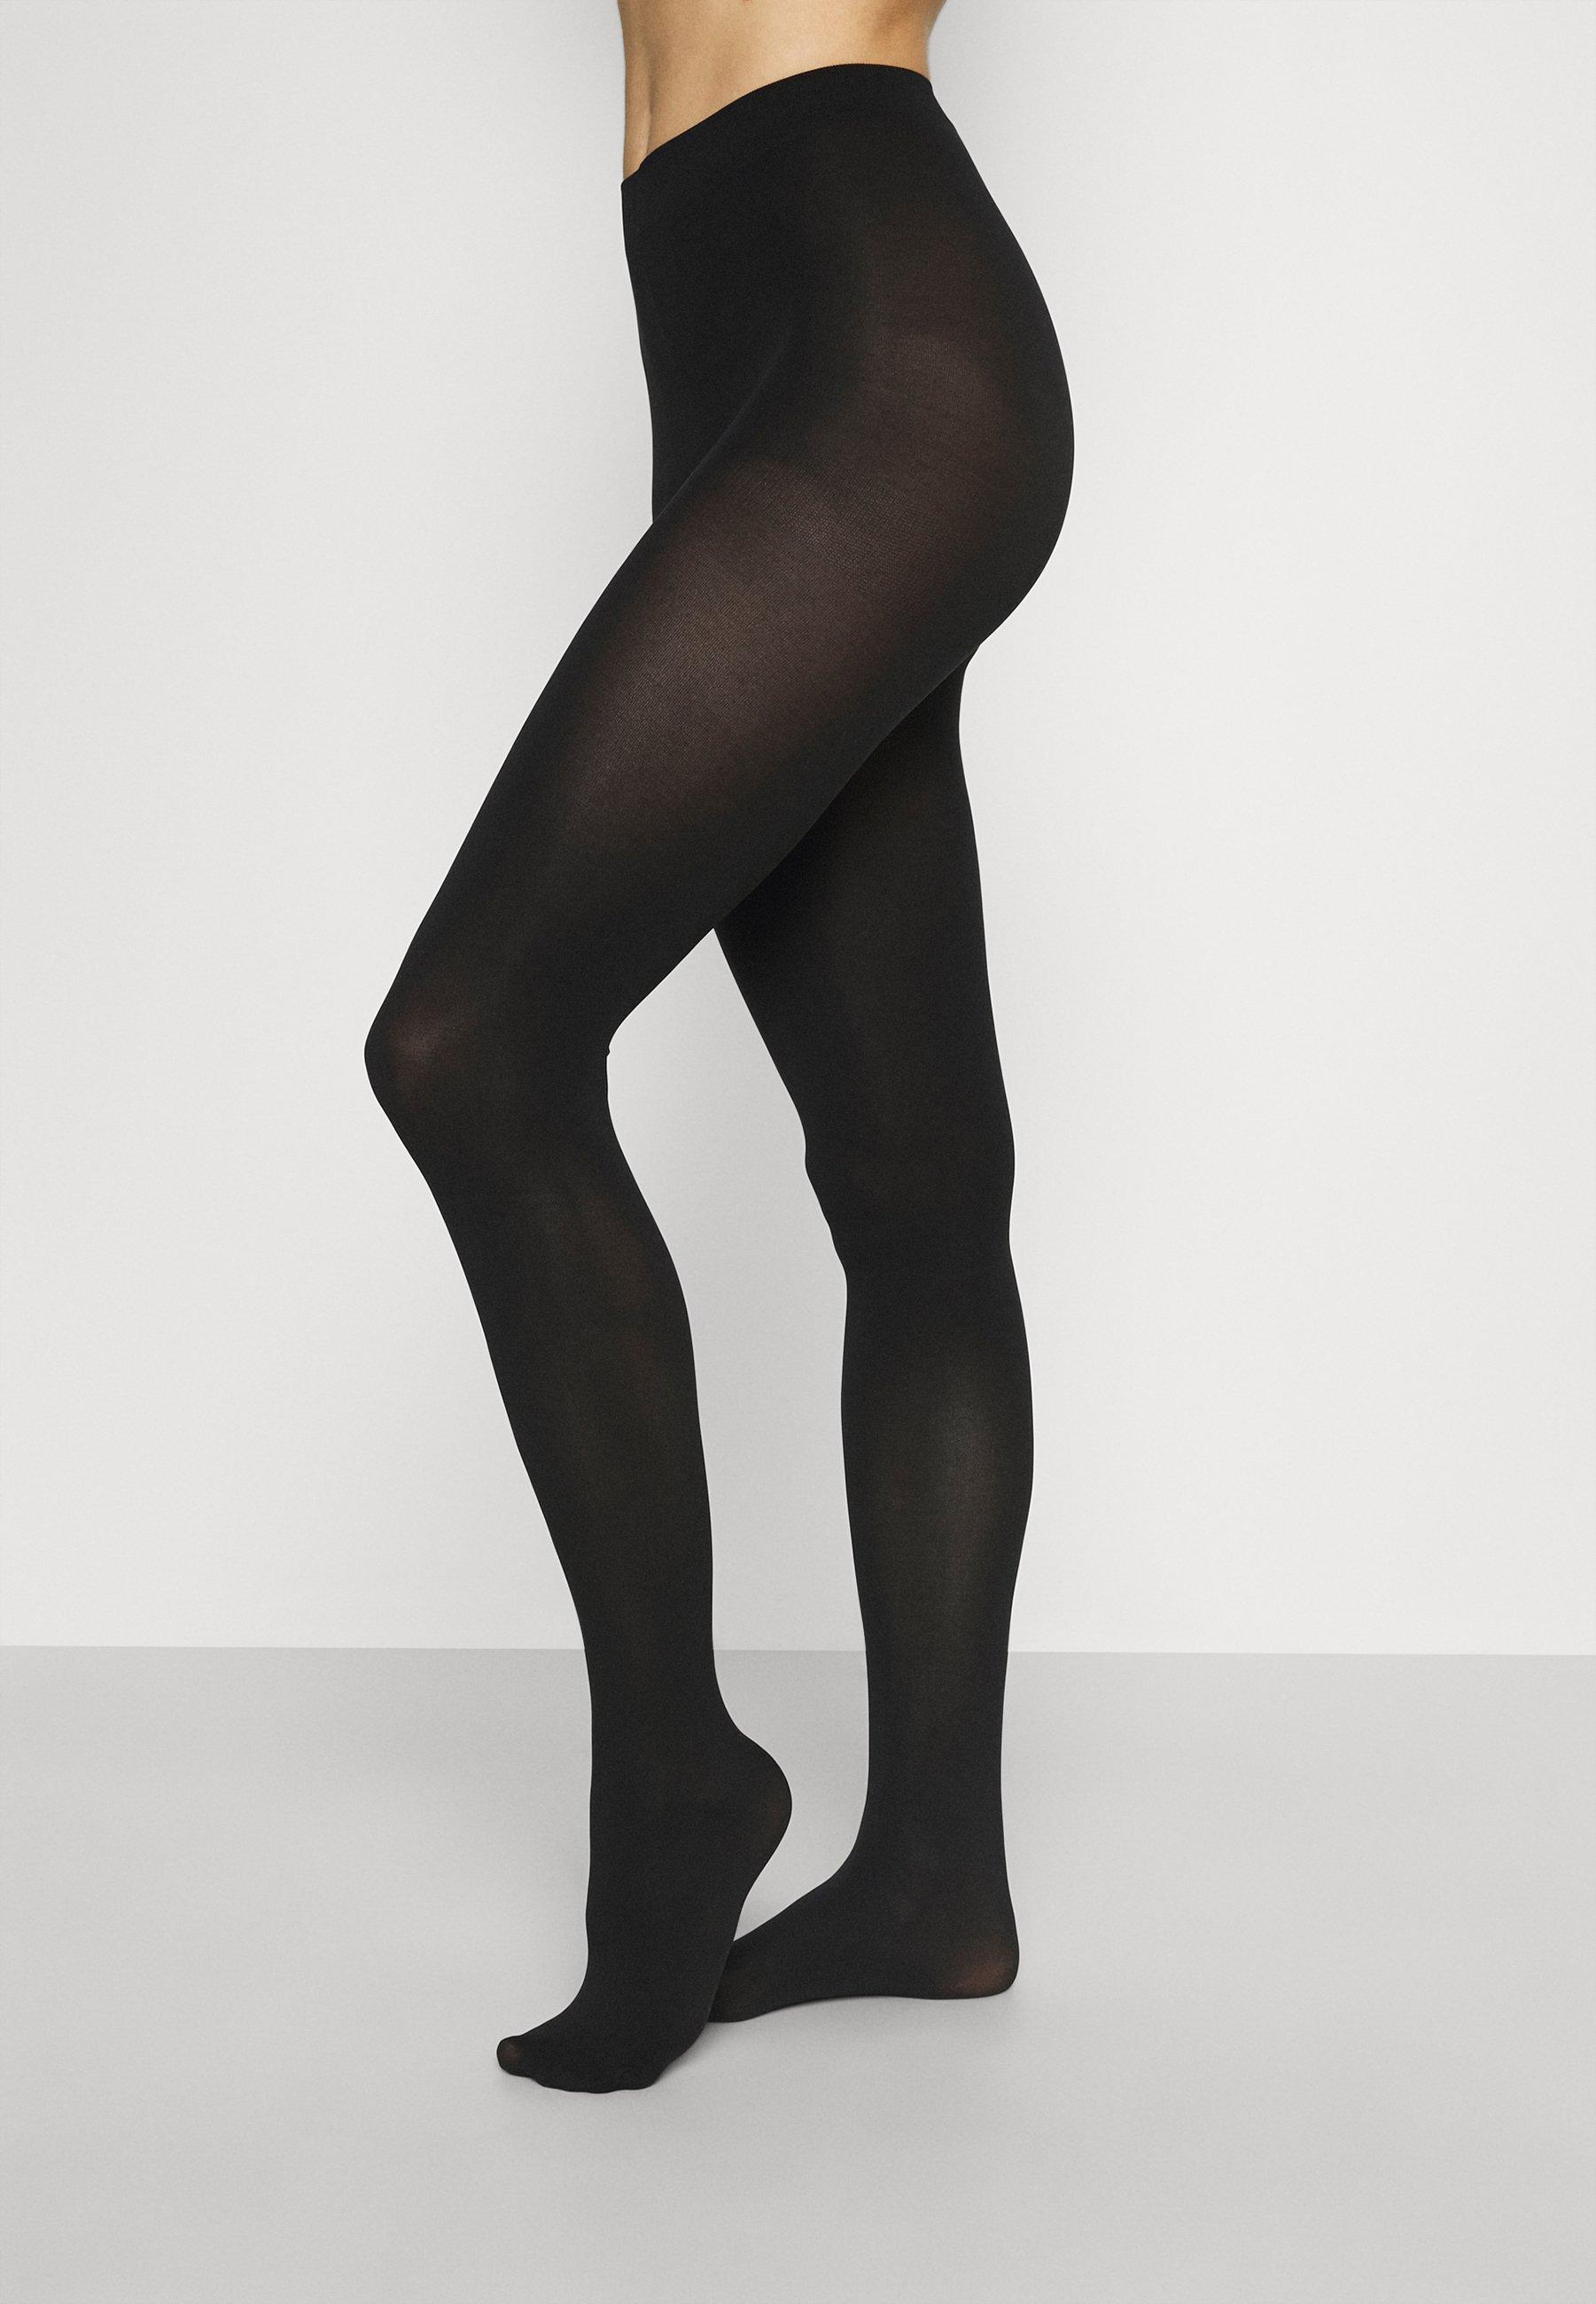 Femme PCNEW NIKOLINE 90 DEN TIGHTS 2 PACK  - Collants